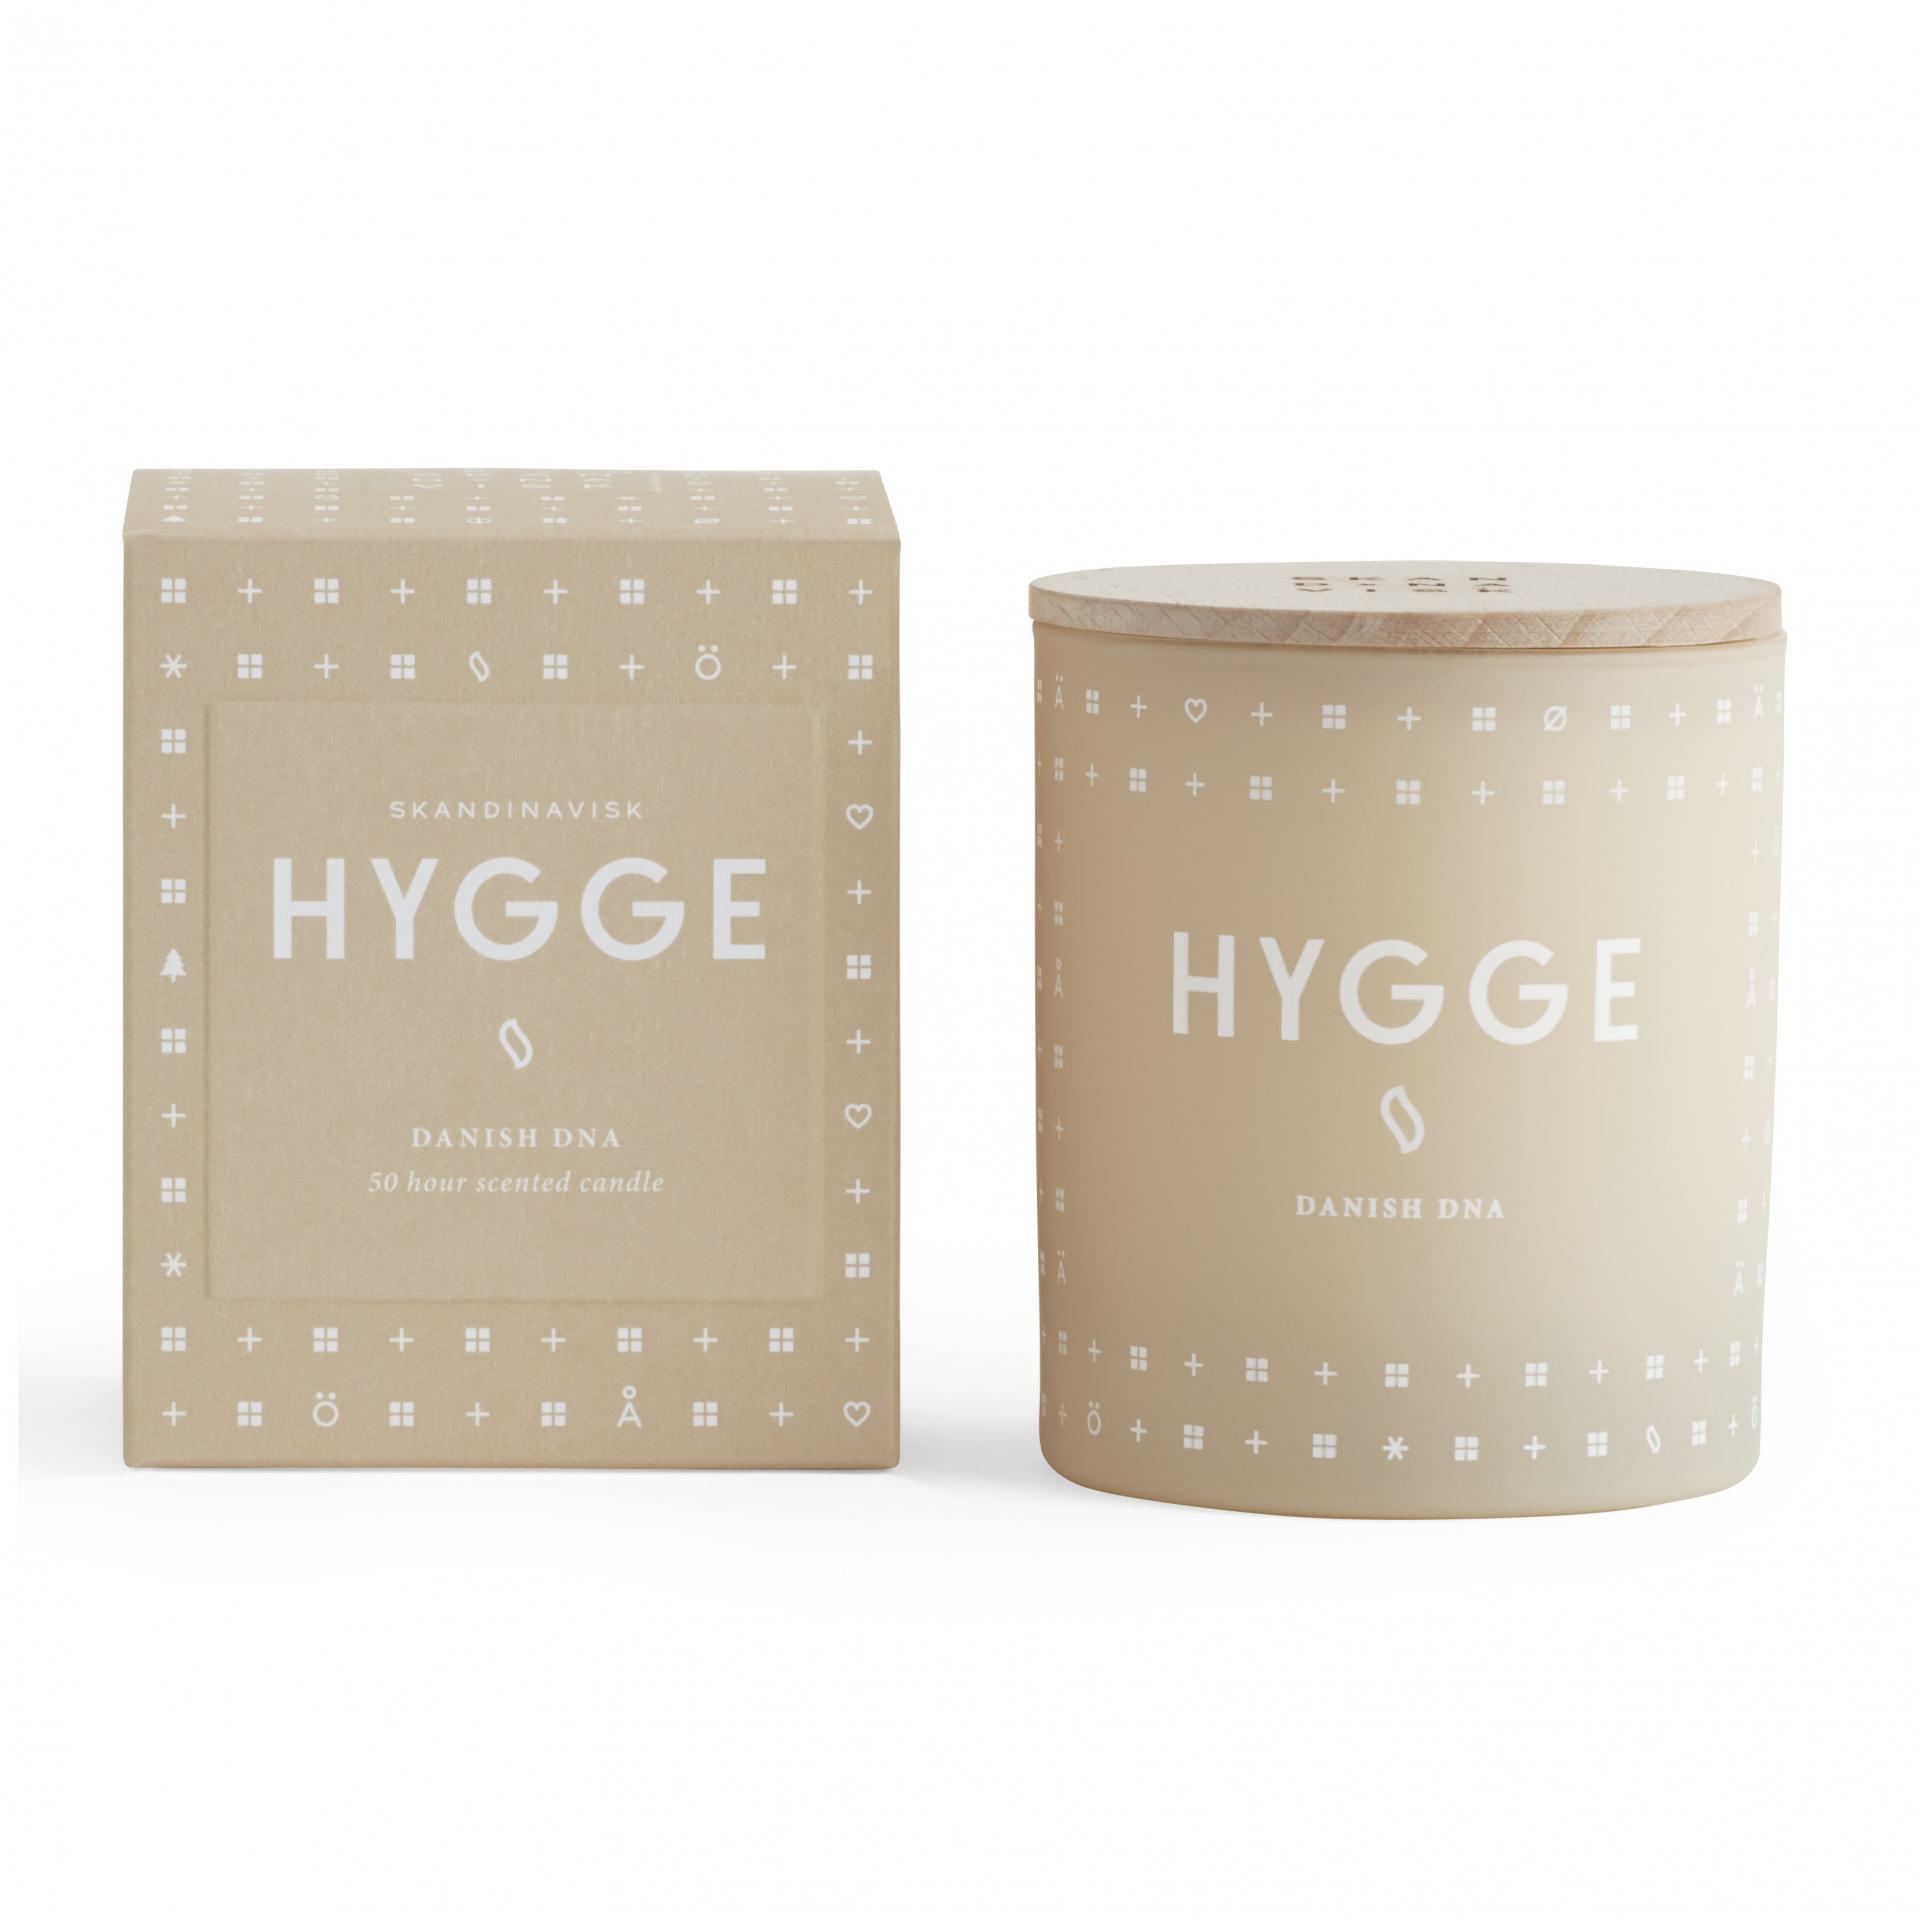 SKANDINAVISK Vonná svíčka HYGGE (útulný domov) 190 g, béžová barva, sklo